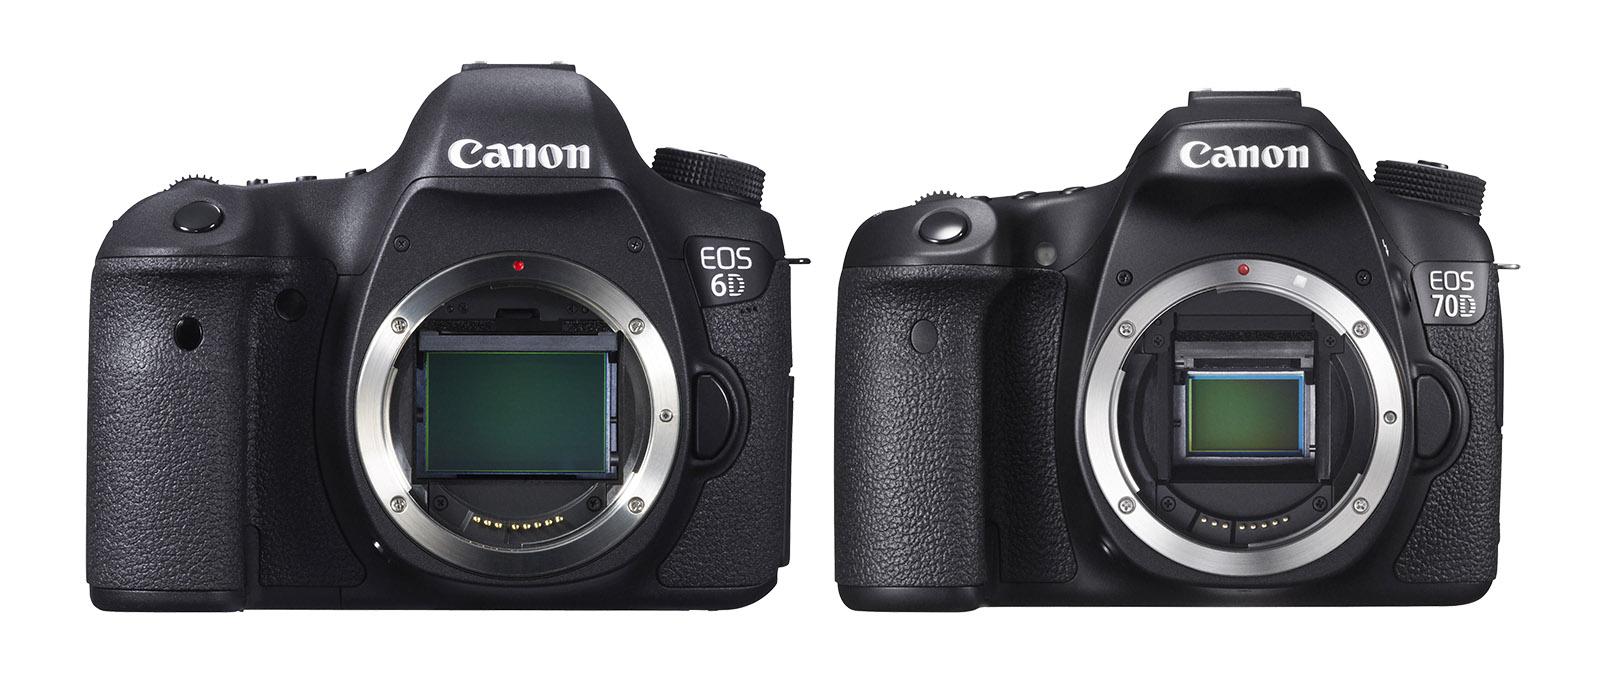 systemkamera test Canon EOS 6D vs EOS 70D fullformat APS-C bildsensor